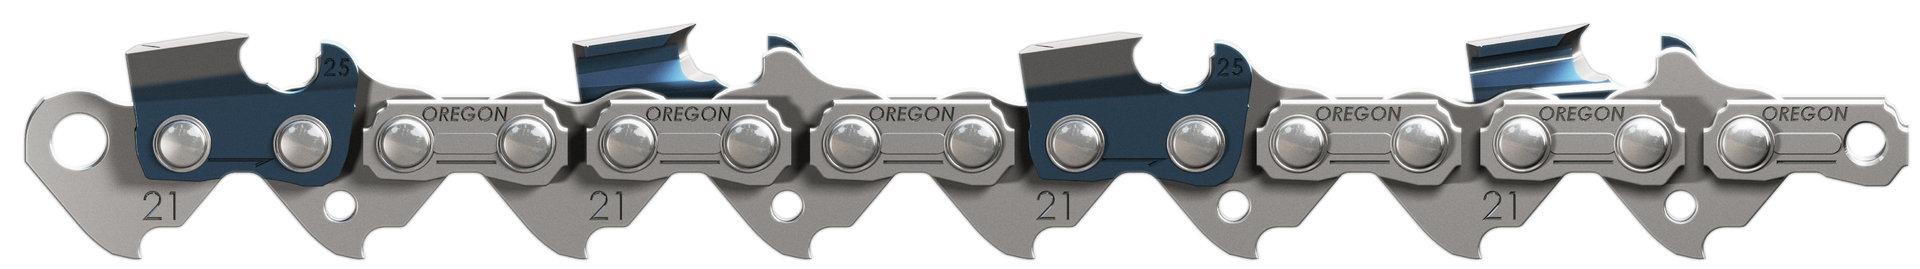 "3 Stück OREGON Sägeketten MICRO-LITE 3//8/"" 1,1 mm 52 TG 90PX052E"